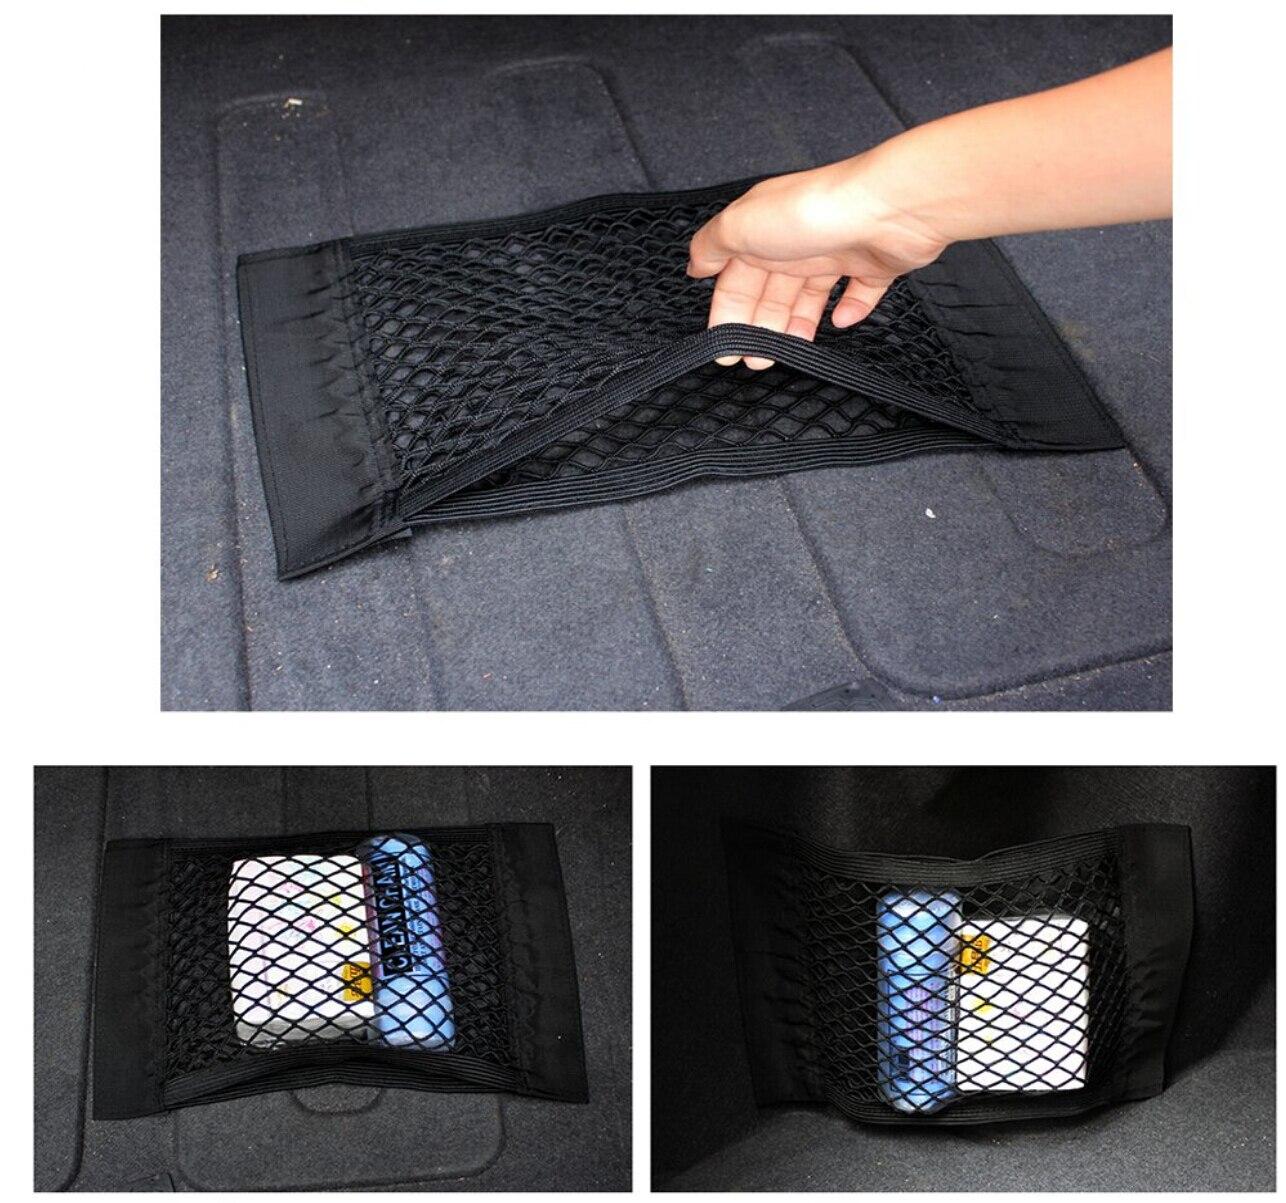 Ящик для хранения в багажник автомобиля, сетчатая Наклейка на мешок для BMW F20 F21 F31 G31 F11 E61 E60 X1 F48 X2 F39 X3 G01 F25 E83, аксессуары